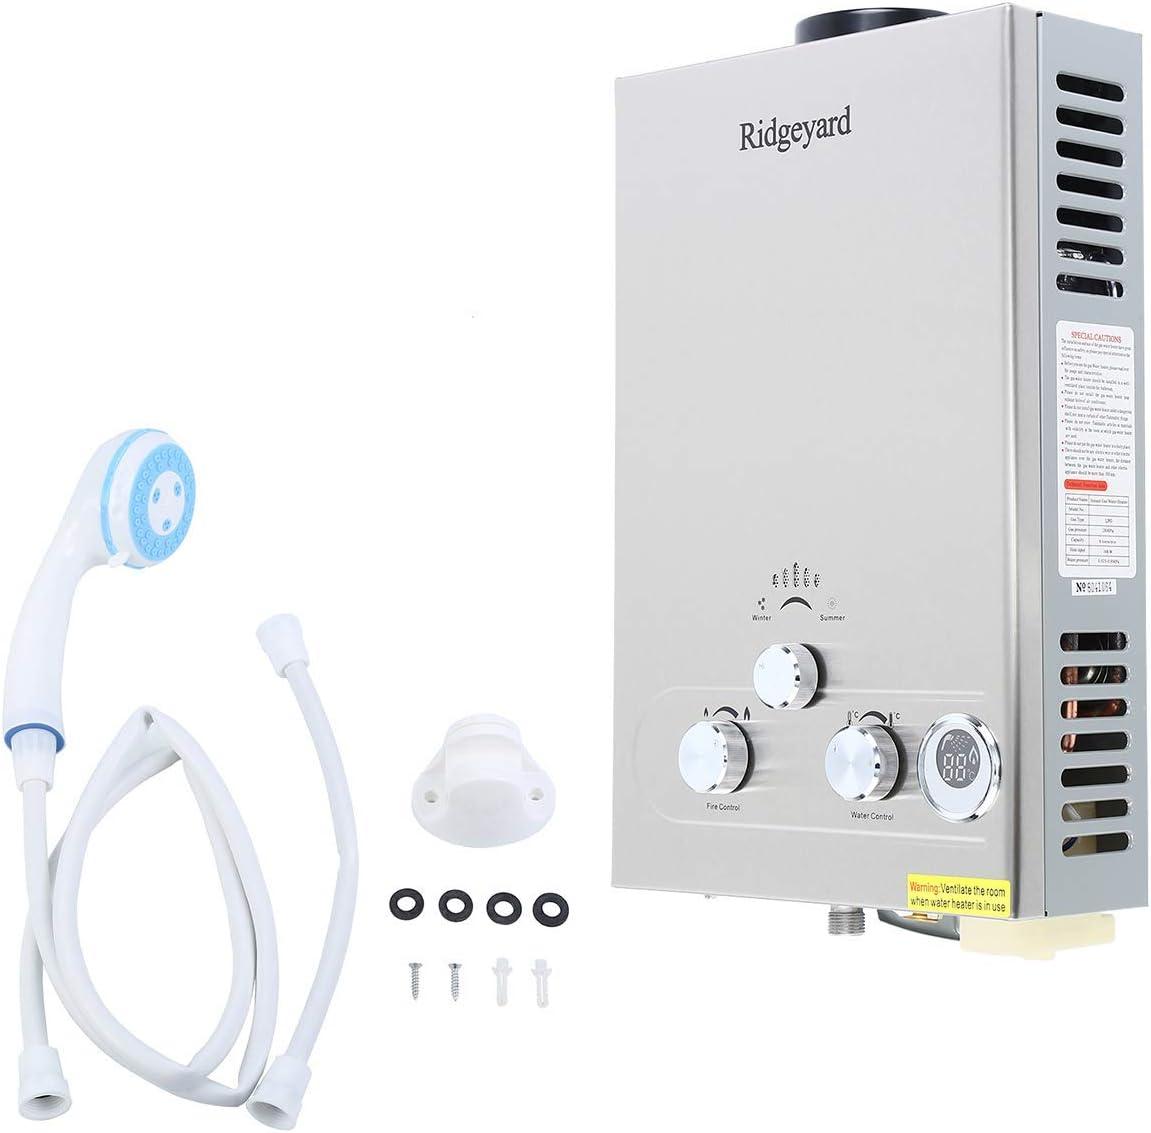 Ridgeyard 10L LPG Propane Gas Warmwasserbereiter Durchlauferhitzer Boiler Xmas